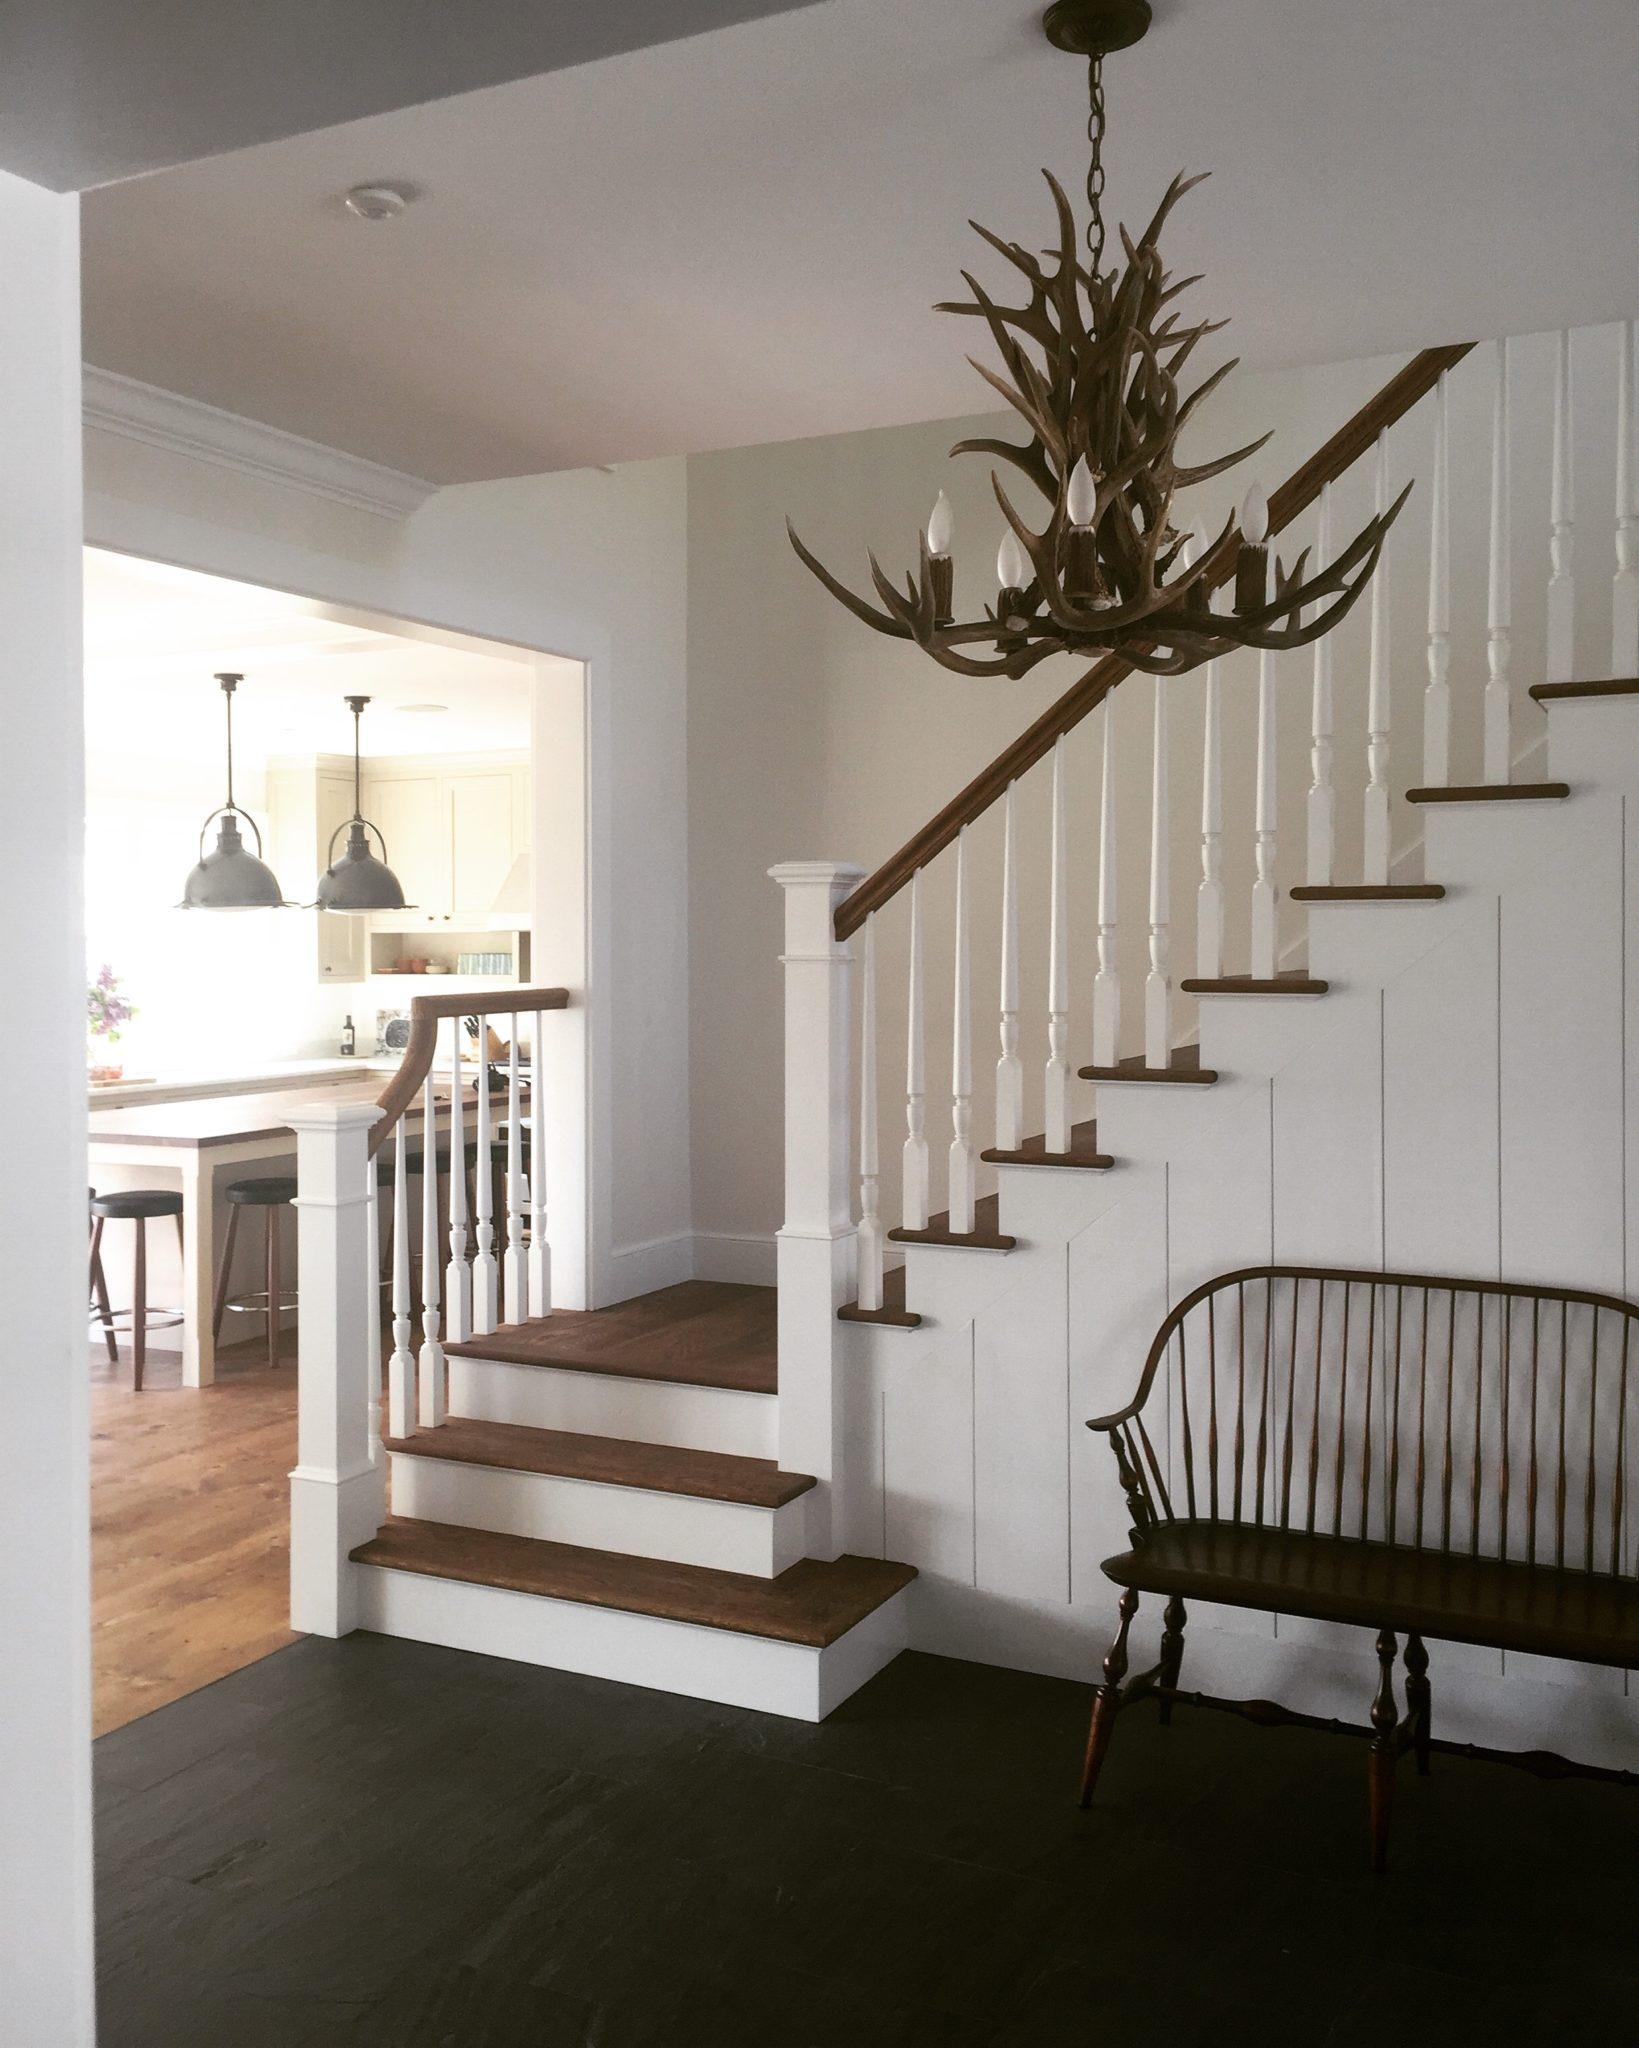 Interior design byKate Nelson Interiors